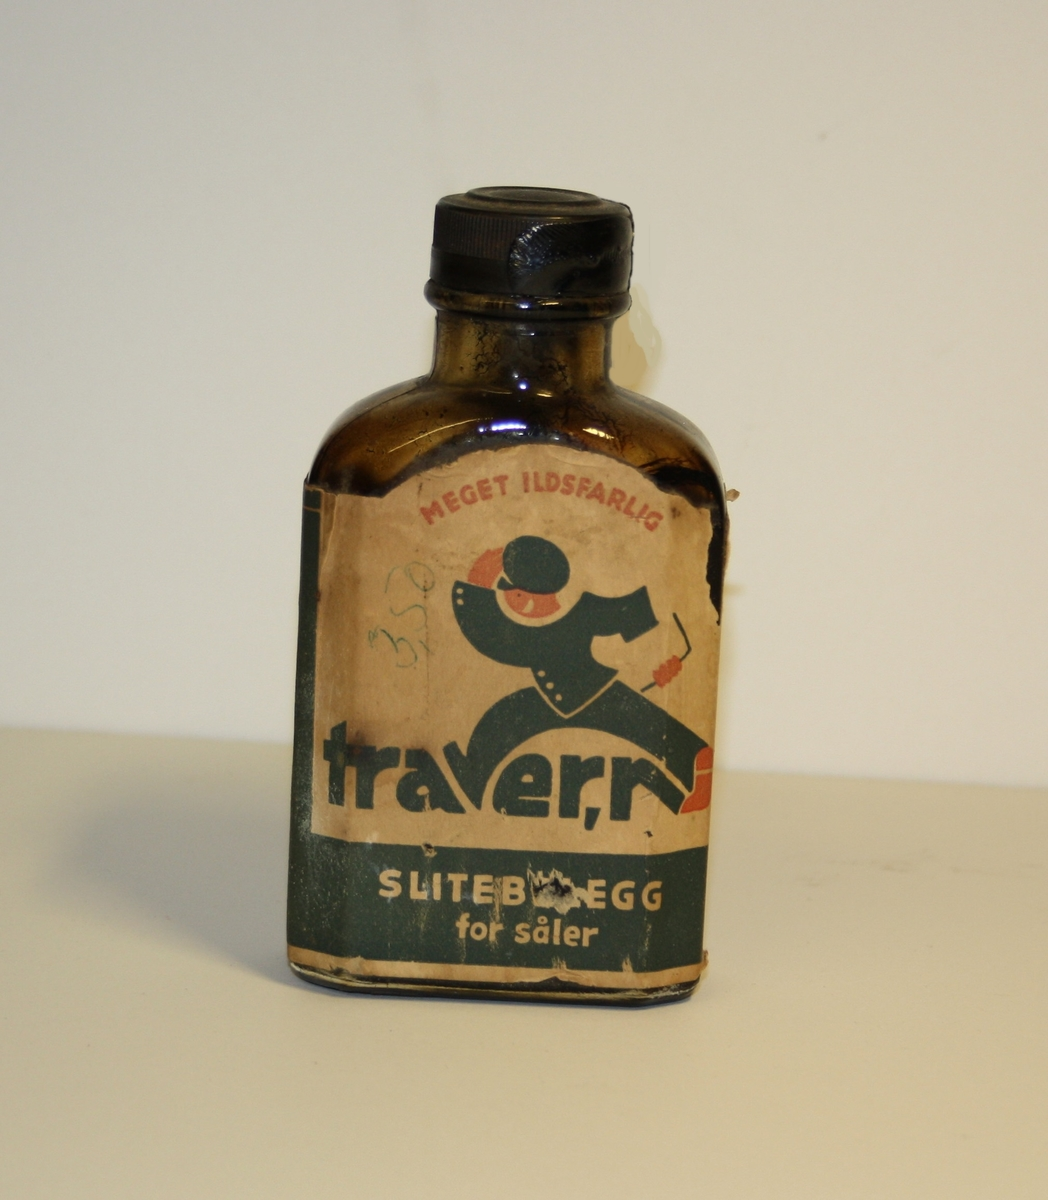 Form: Lita flat flaske med skrukork og pålimt etikett.